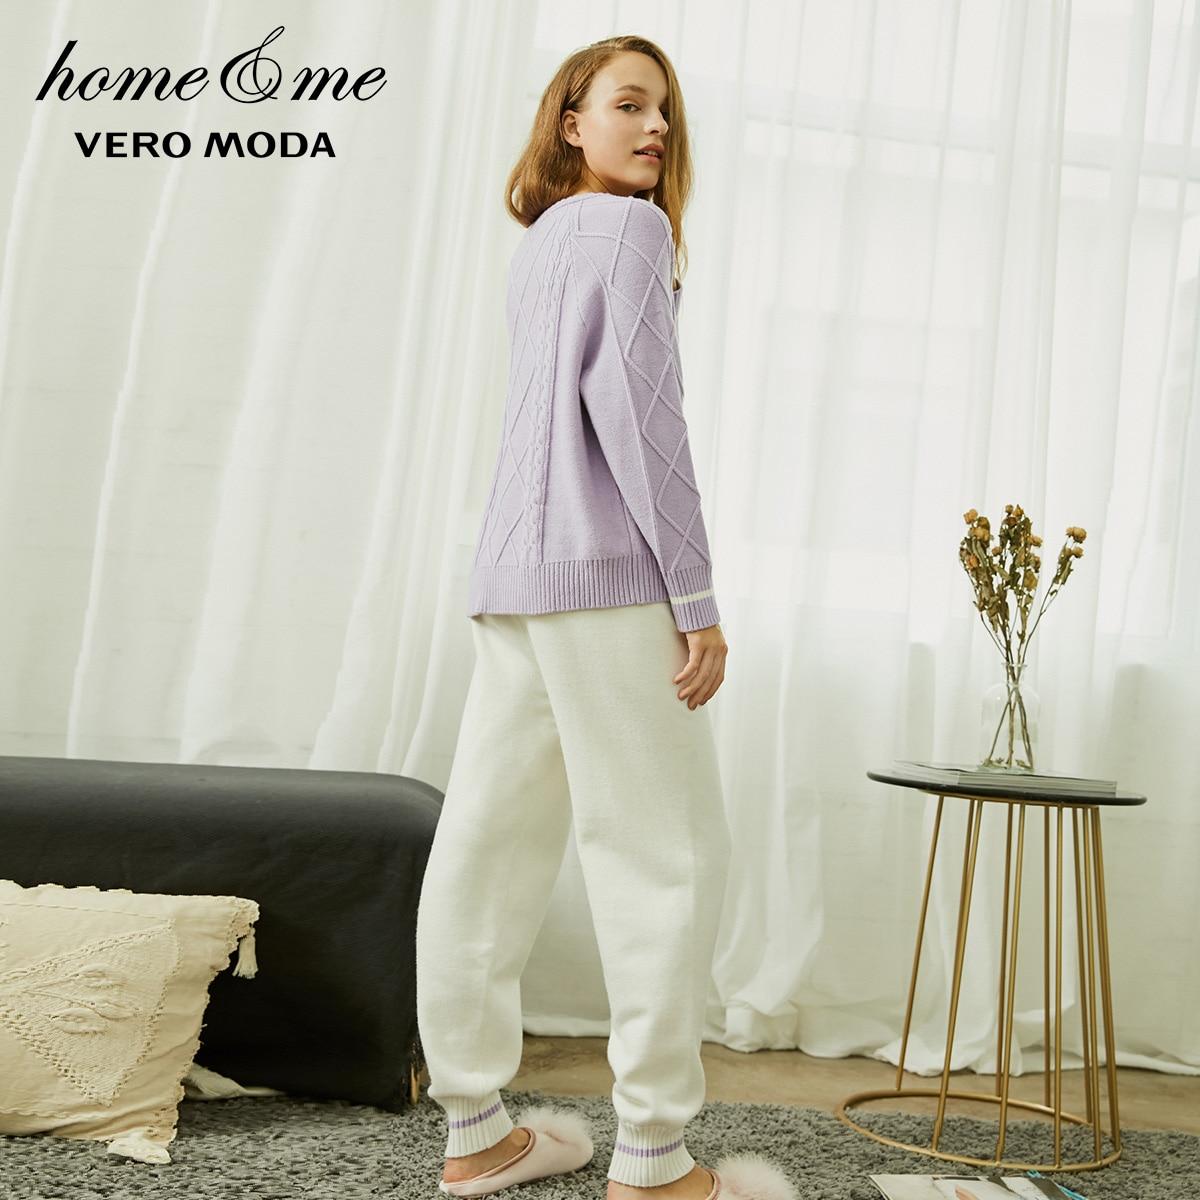 Image 3 - Vero Moda nouveau pull en tricot torsadé jambe pantalon costume homewear  3184K6501-in Ensembles de pyjama from Sous-vêtements et pyjamas on AliExpress